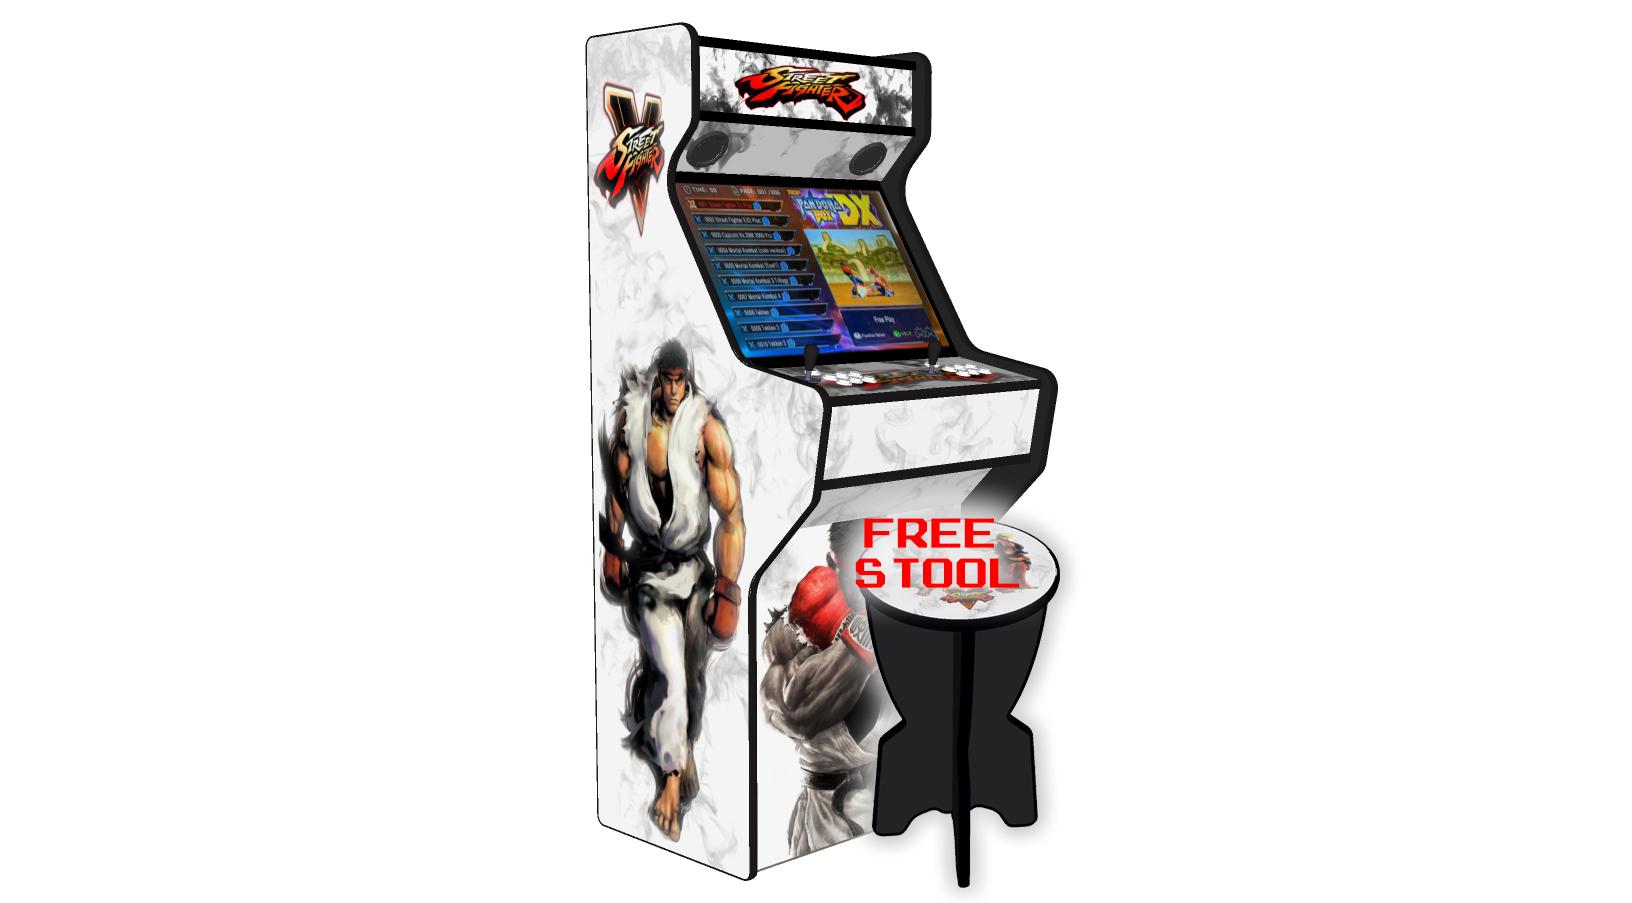 Street Fighter 5 - 27 Inch Upright Arcade Machine - American Style Joysticks - Red Tmold - Left